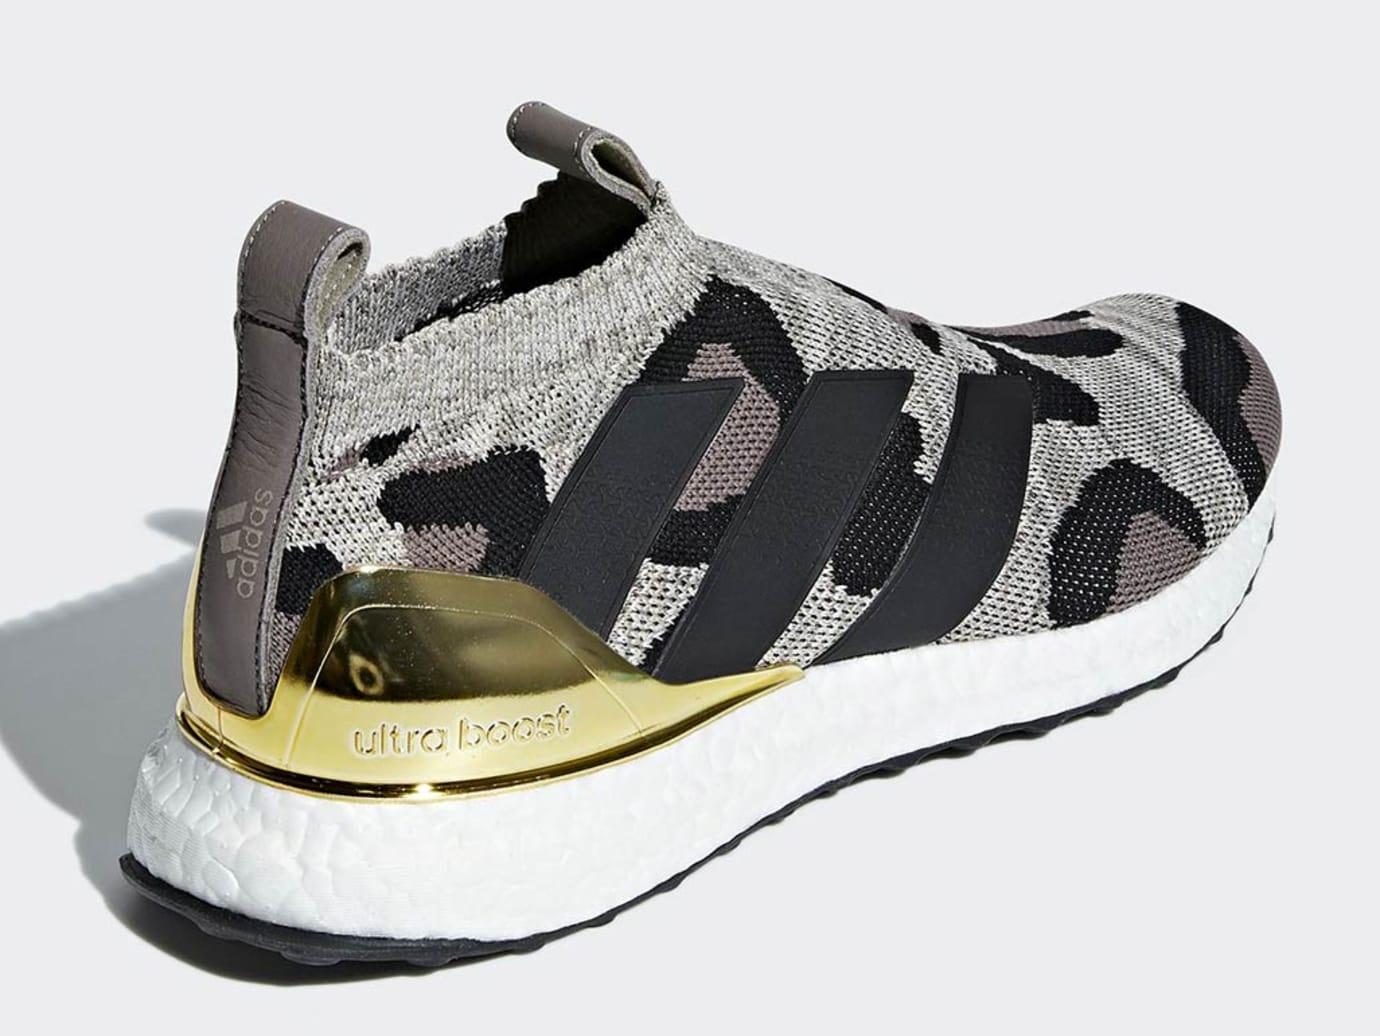 cheap for discount 8010f 31a31 Adidas A 16+ Ultra Boost Cheetah BB7418 Release Date